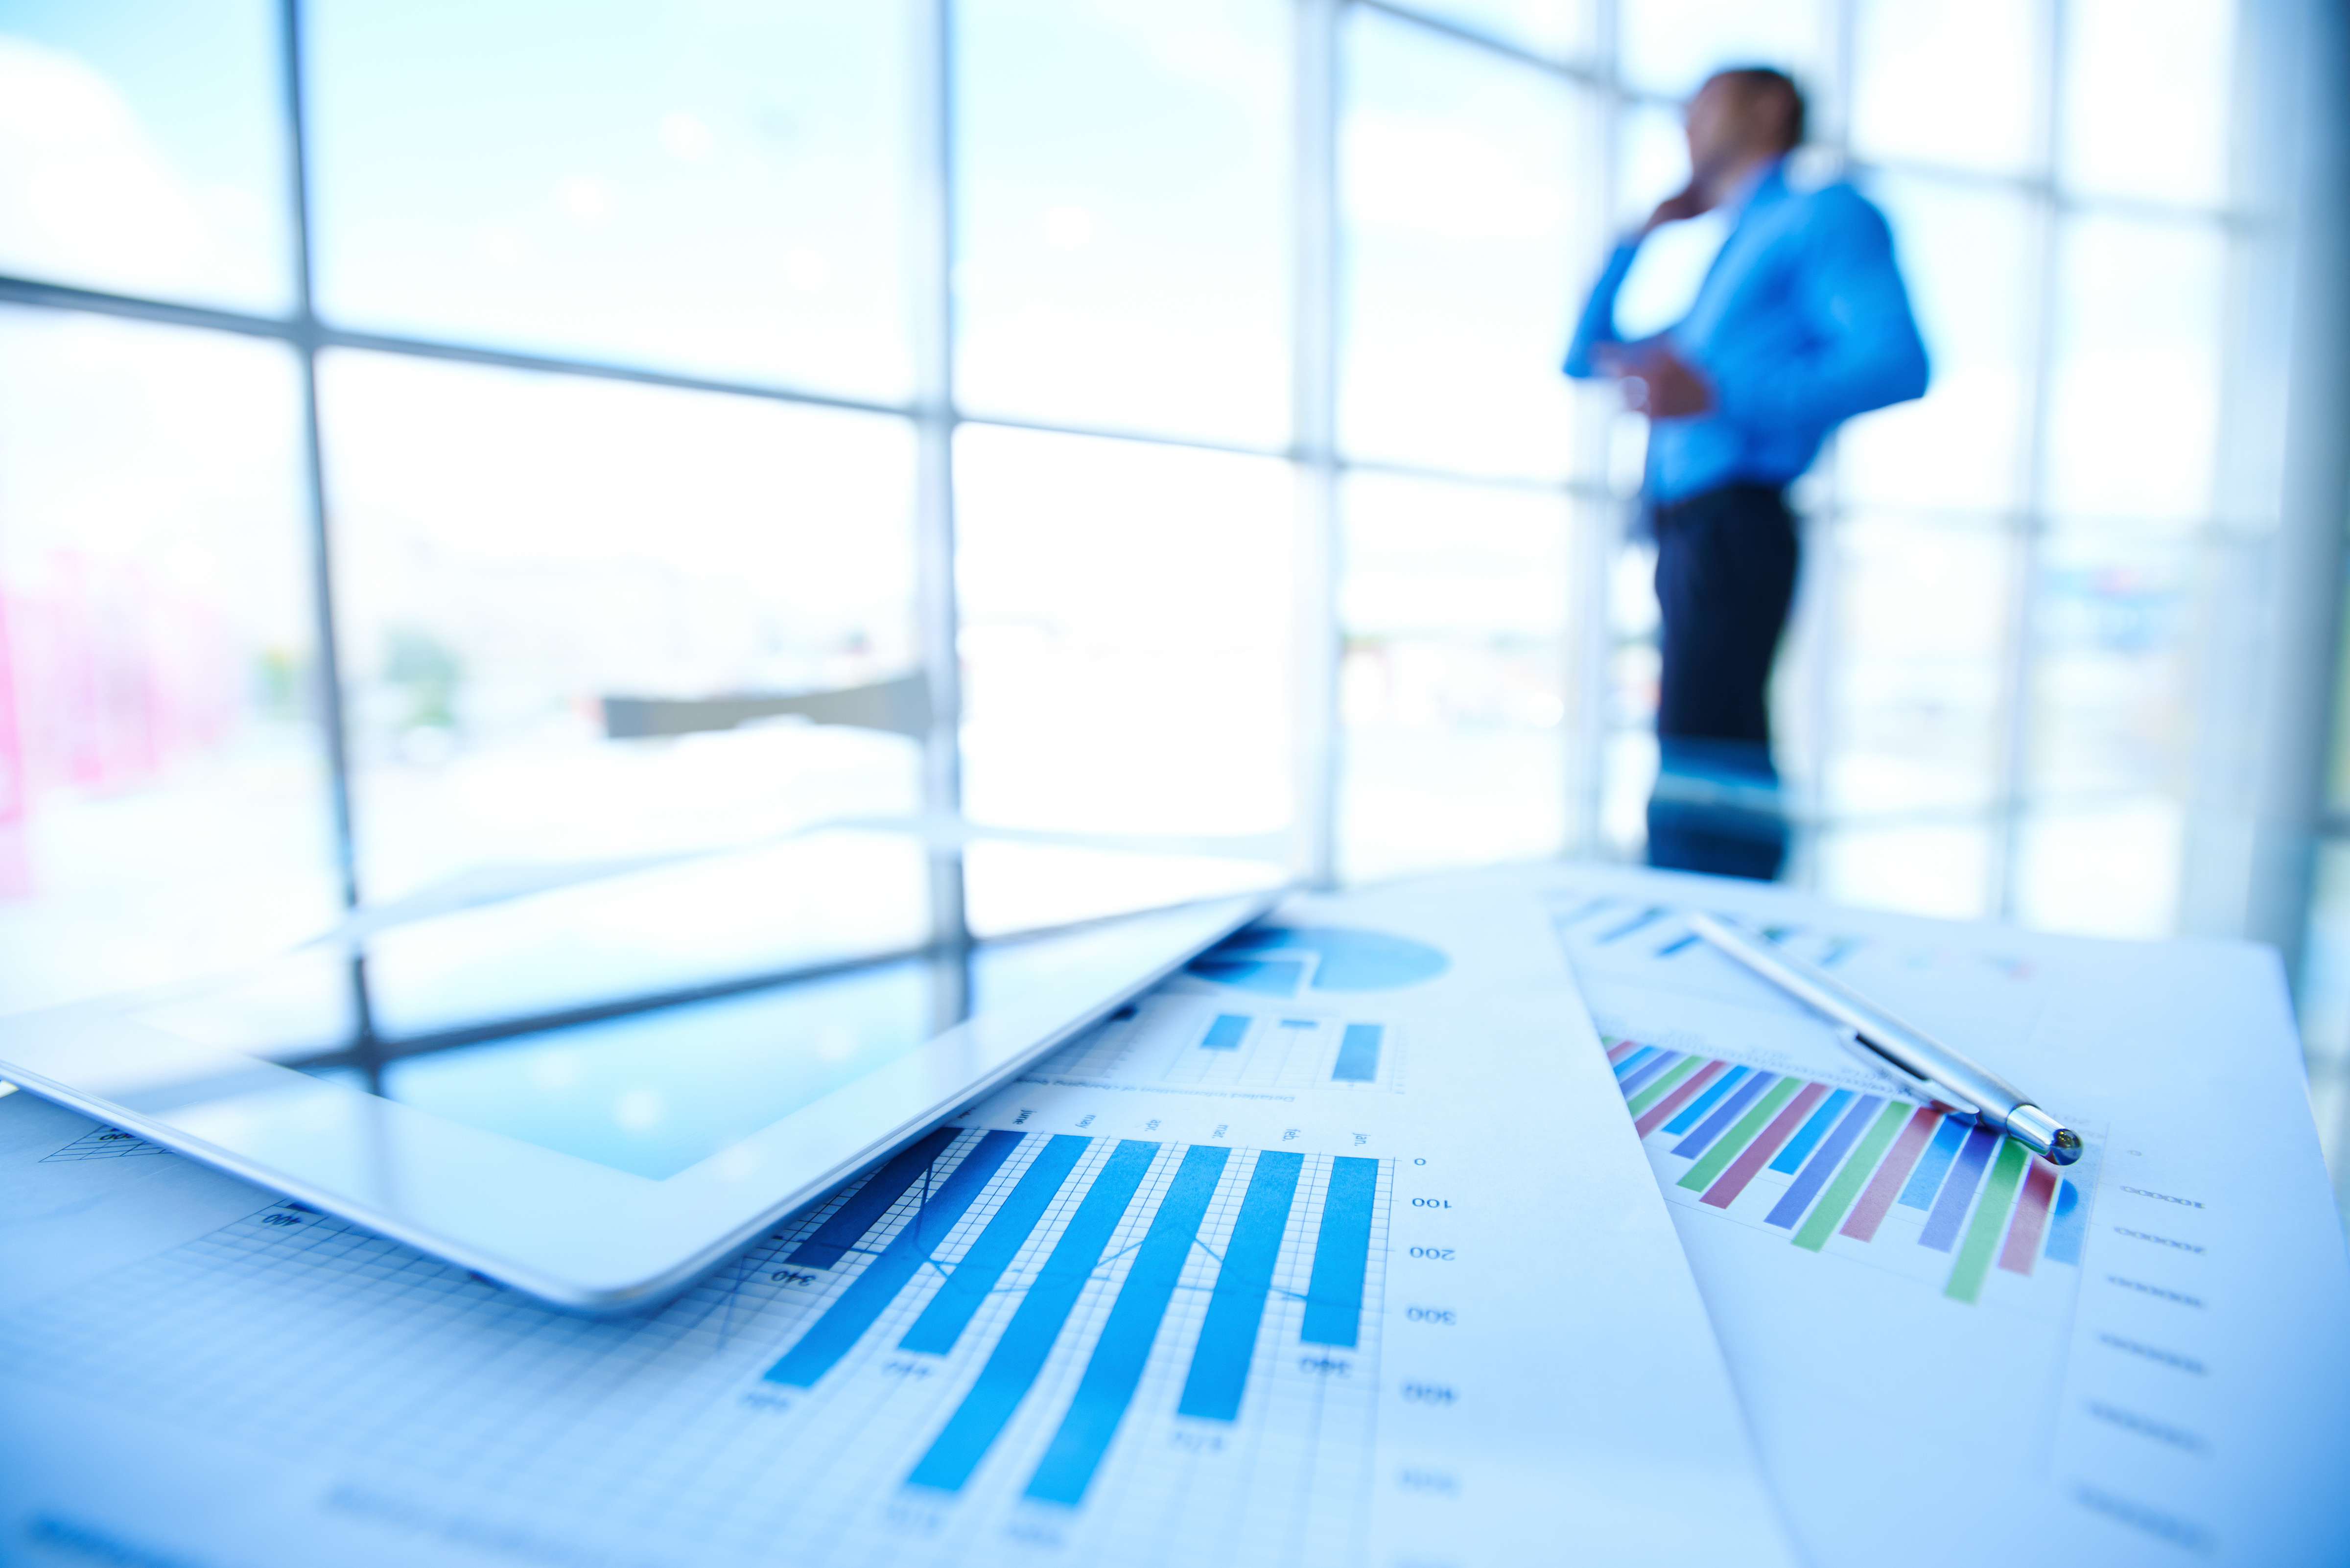 Empresa Data-Driven: el dato como activo estratégico